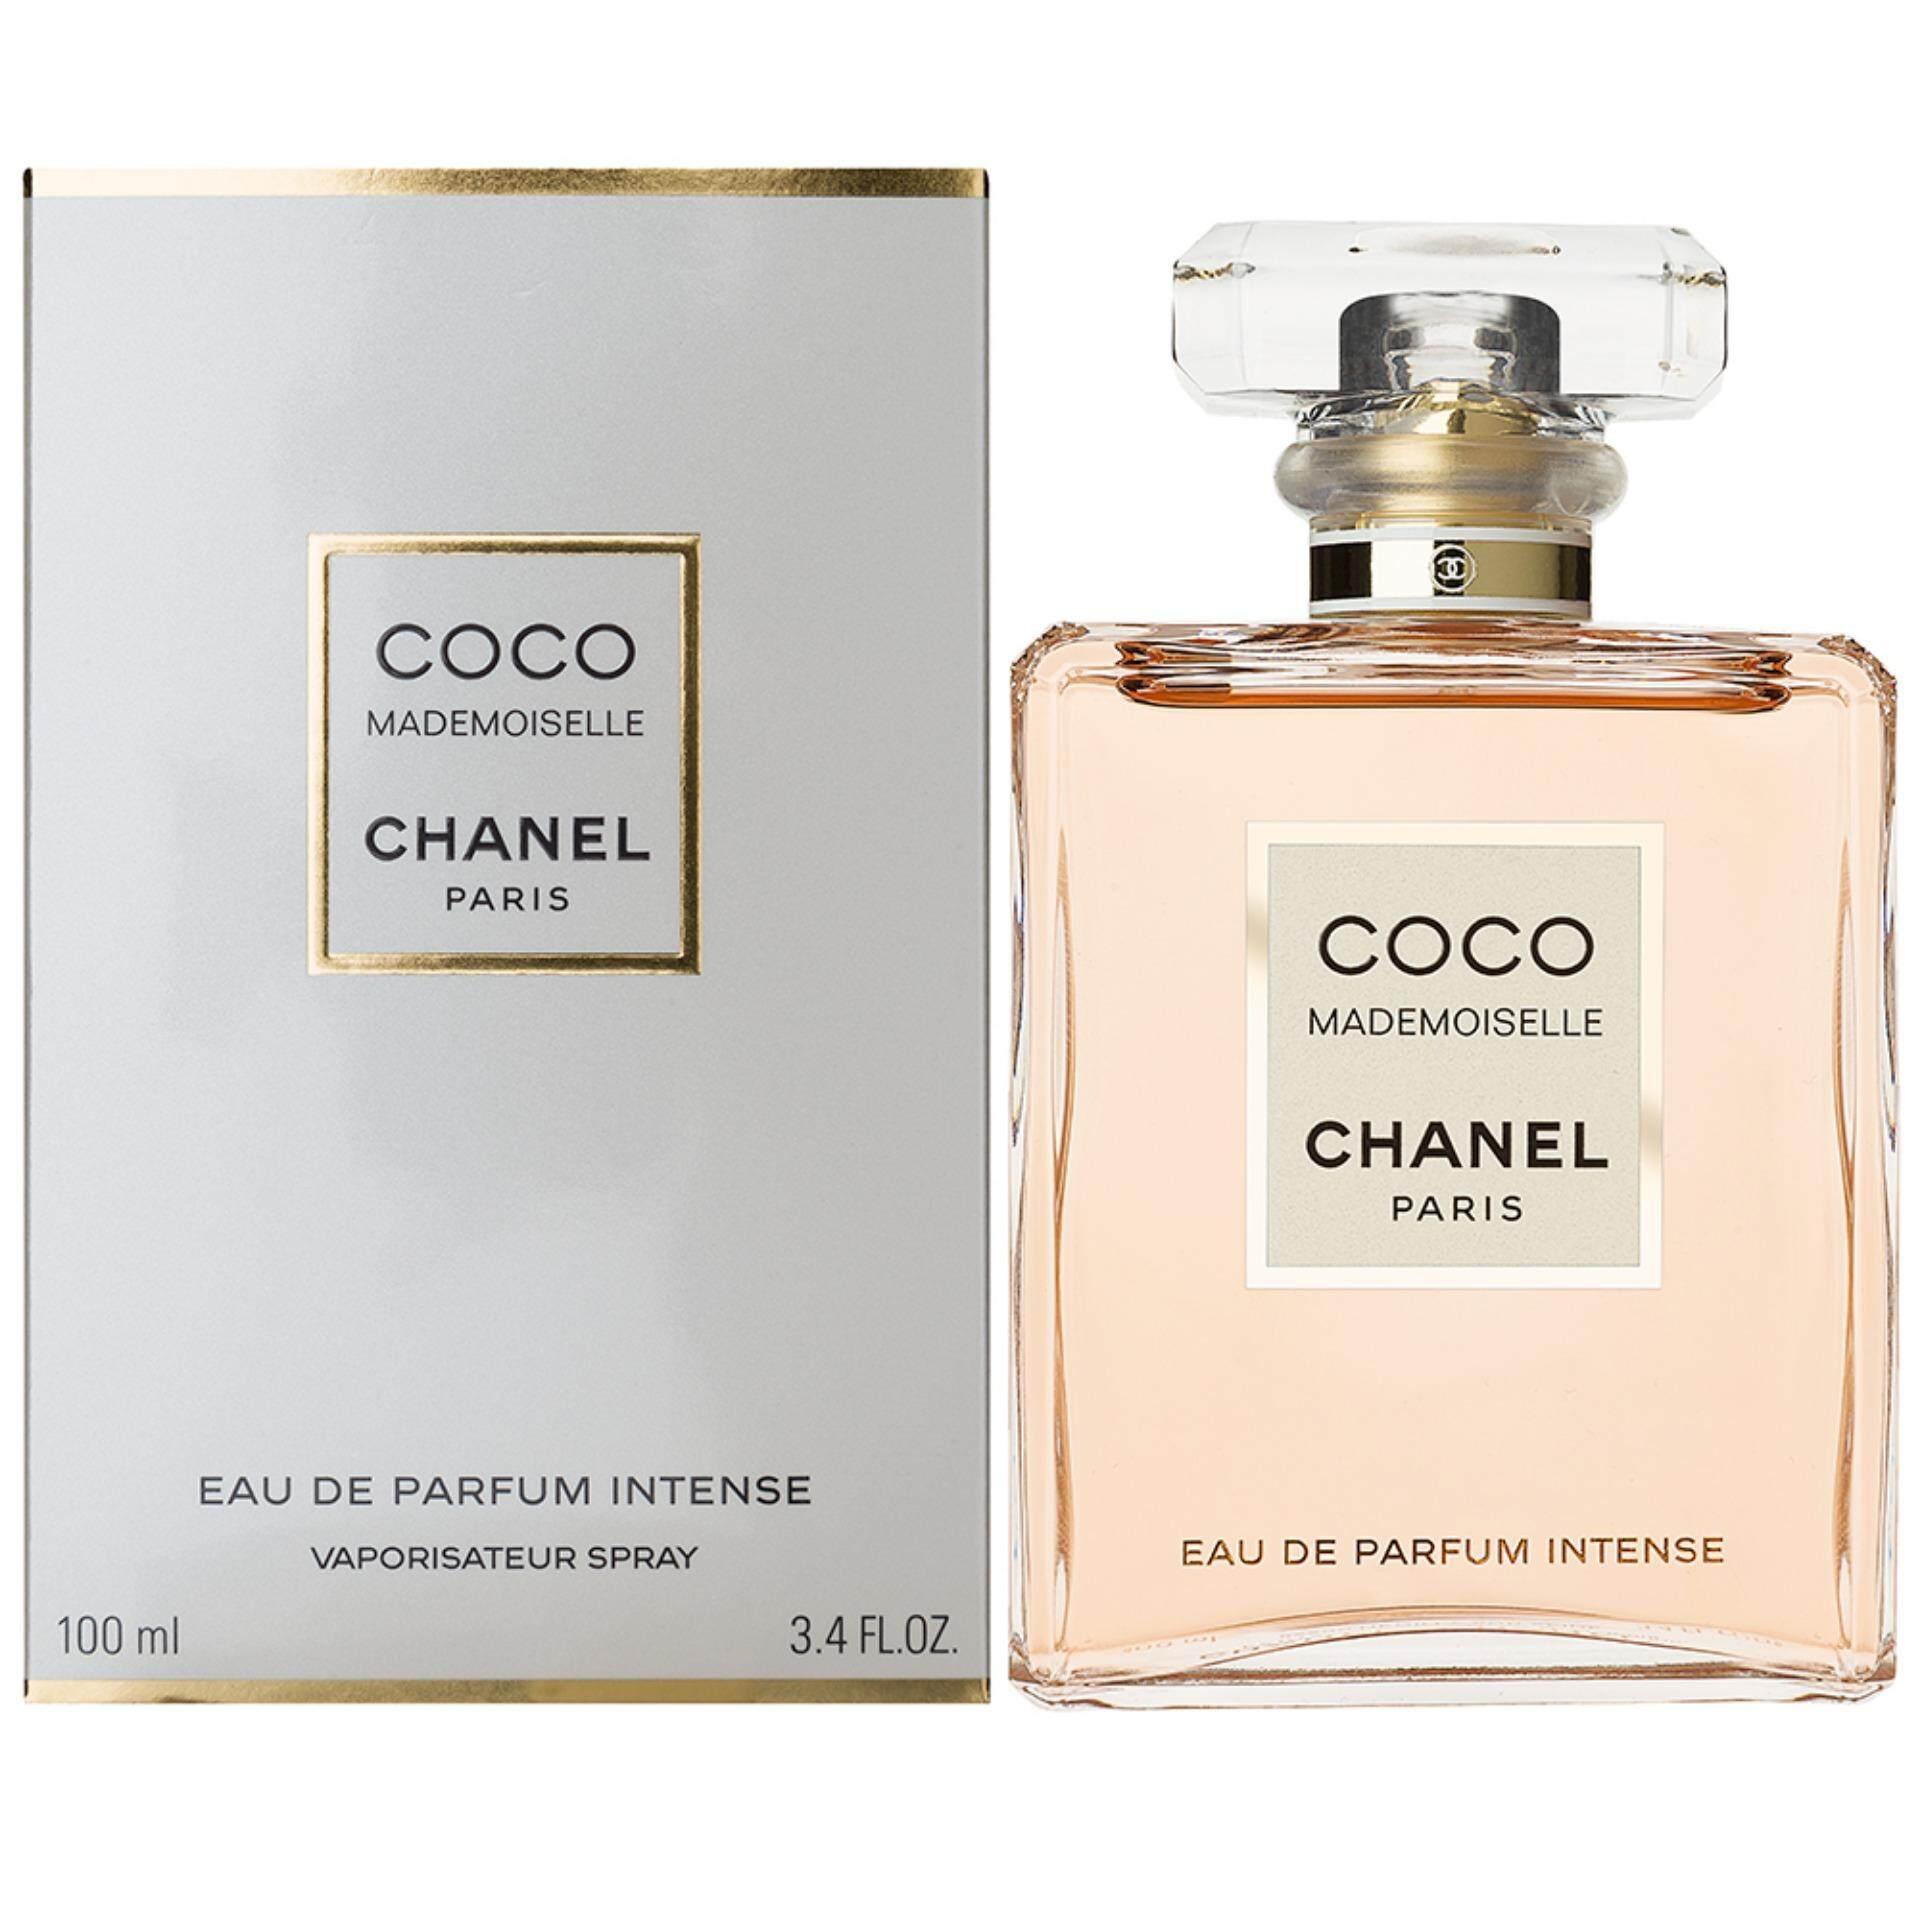 Perfumes For Men Women The Best Price In Malaysia Benetton B United Jeans Edt Man Parfum 100ml 100 Original Coco Mademoiselle Eau De Intense